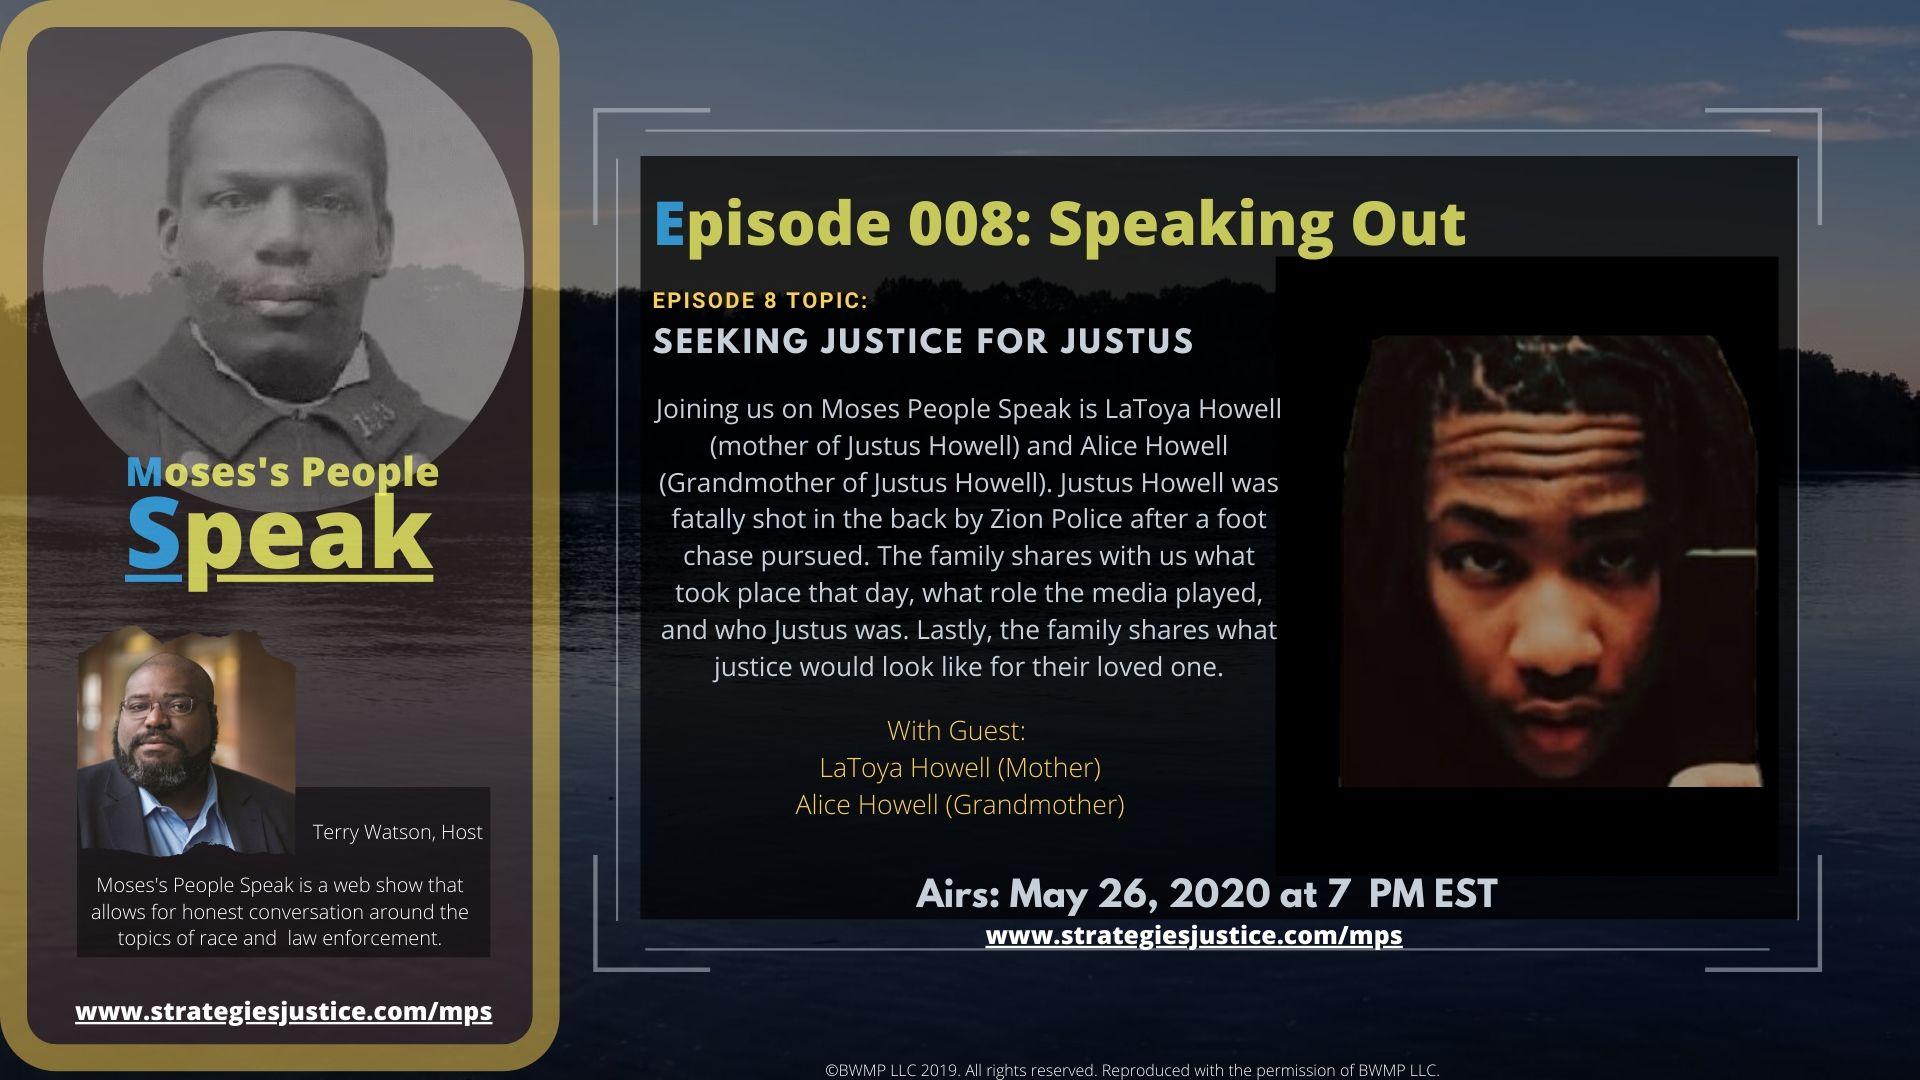 Ep 008 Seeking Justice for Justus